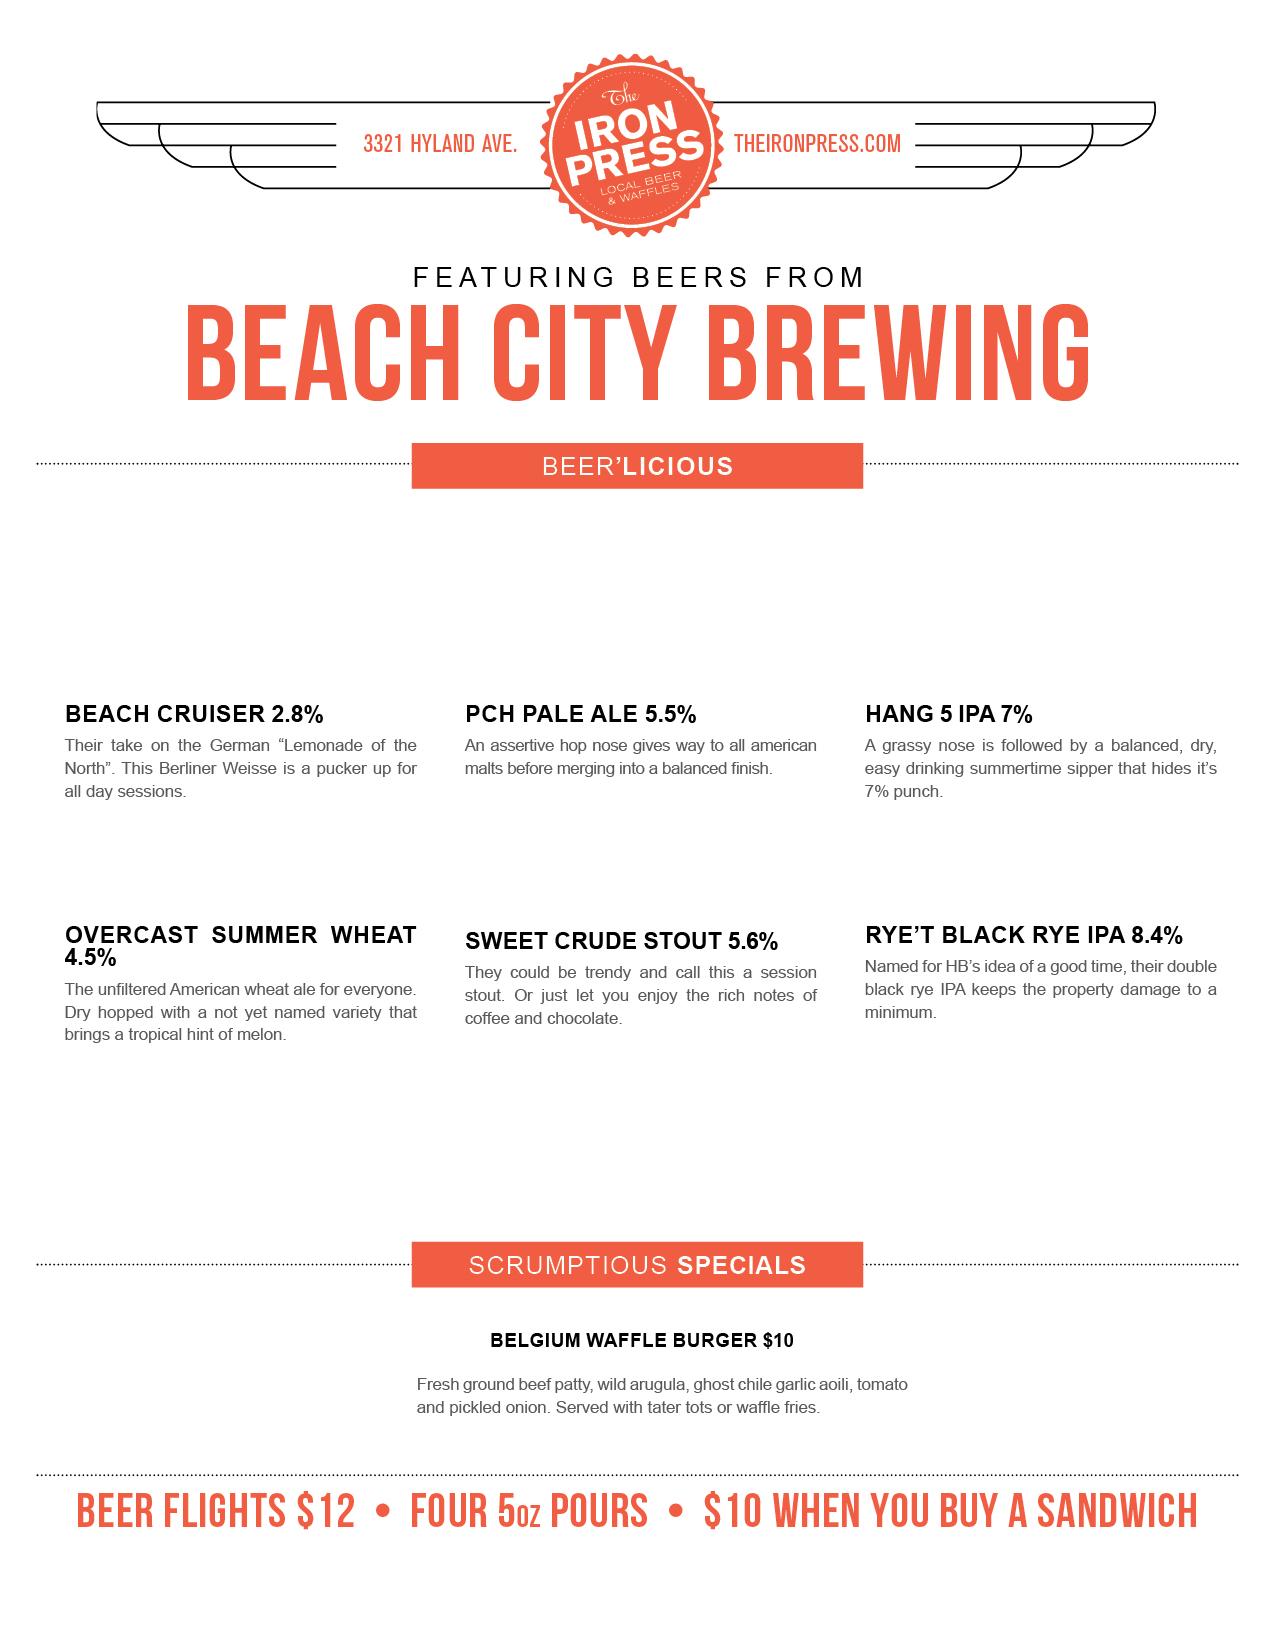 Beach City Brewery x The Iron Press